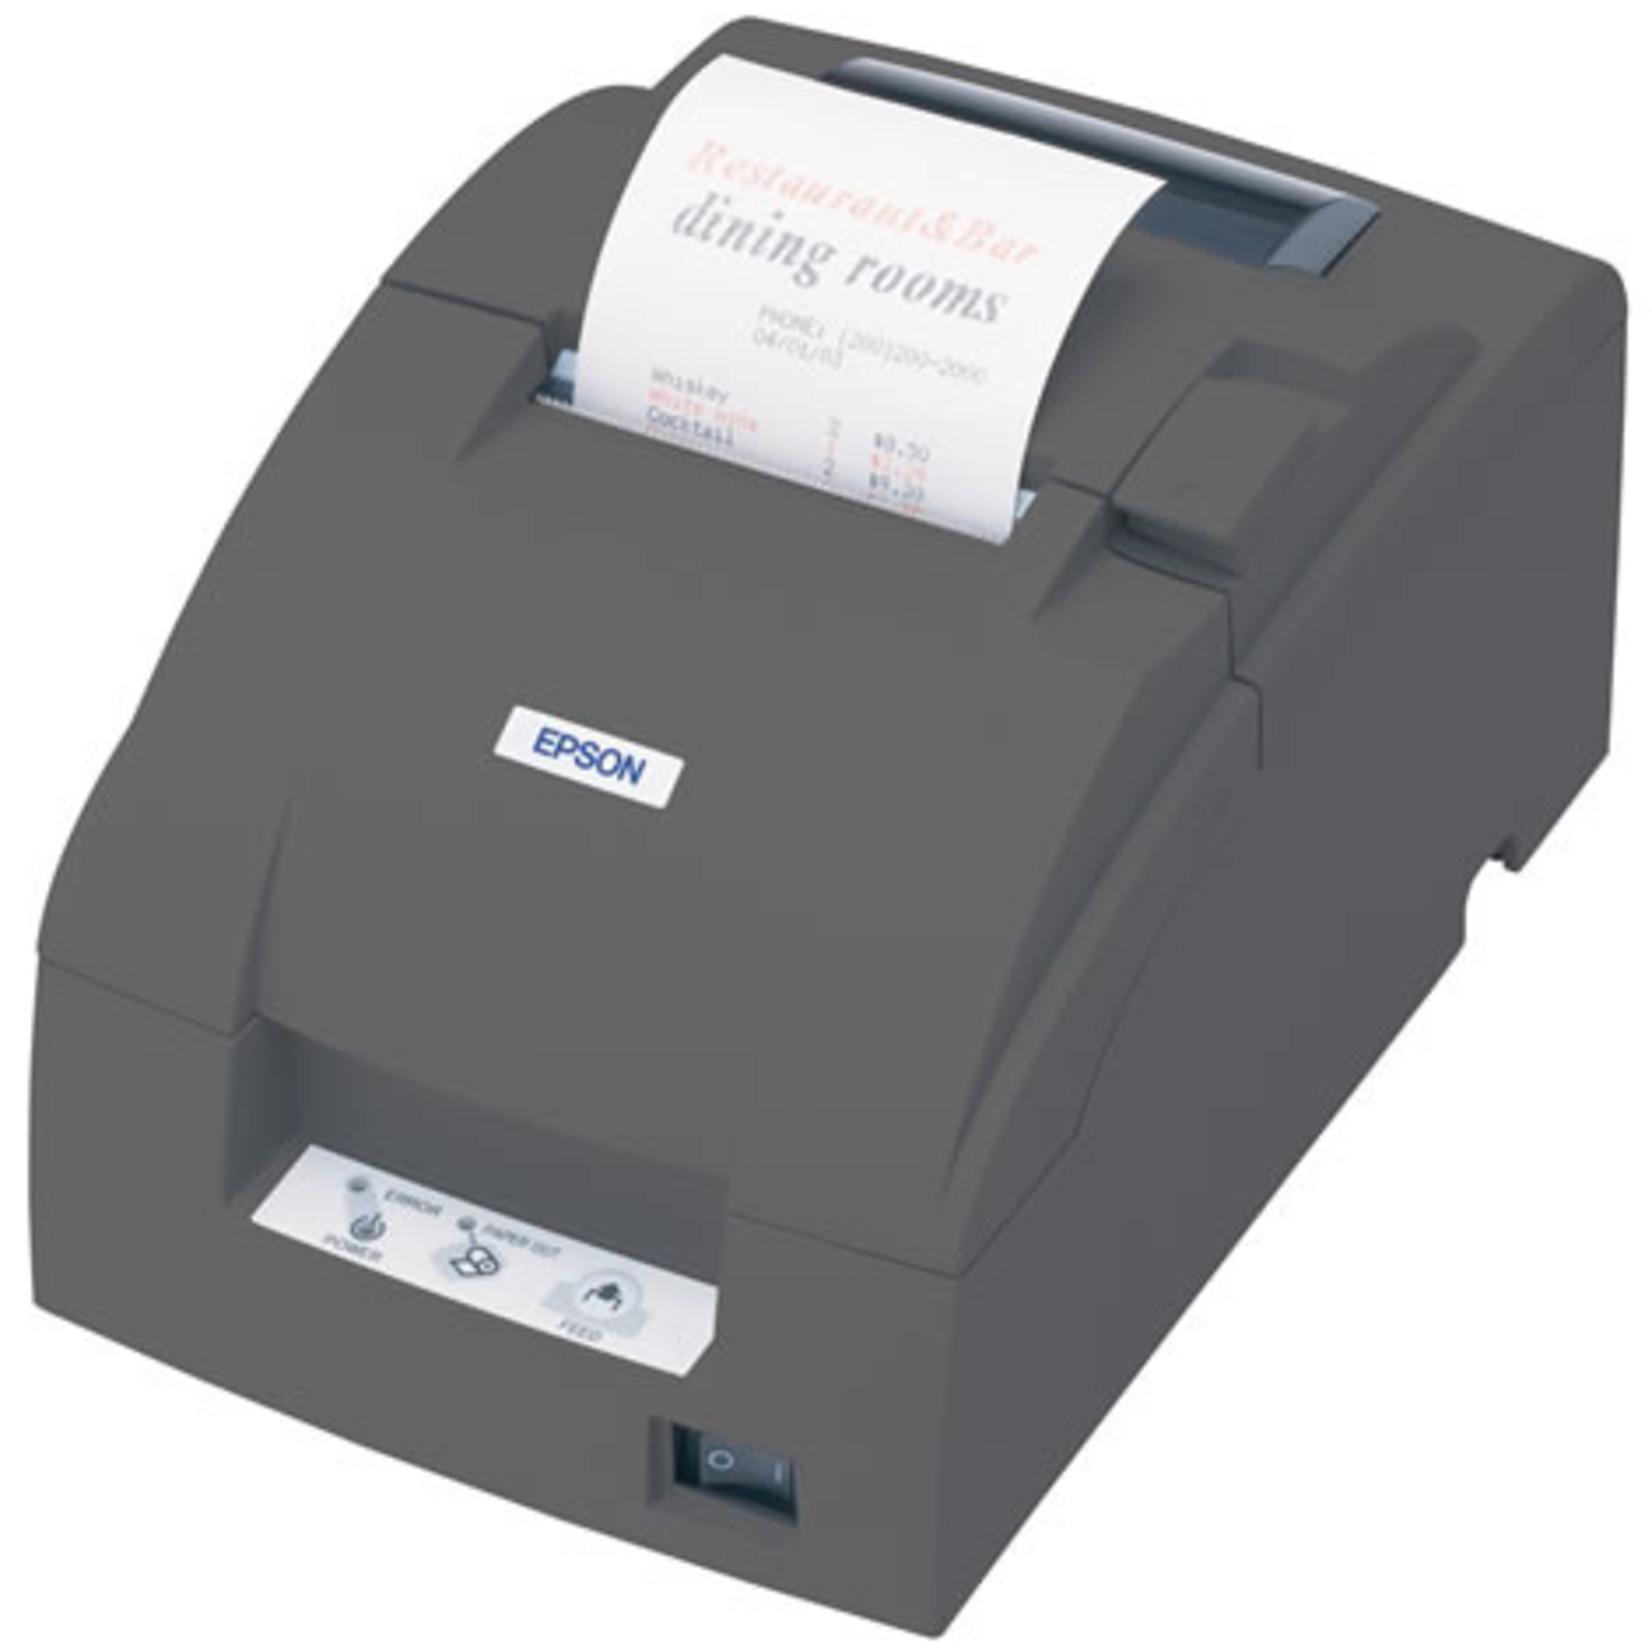 Epson Epson TM-U220B Ethernet Kitchen Printer